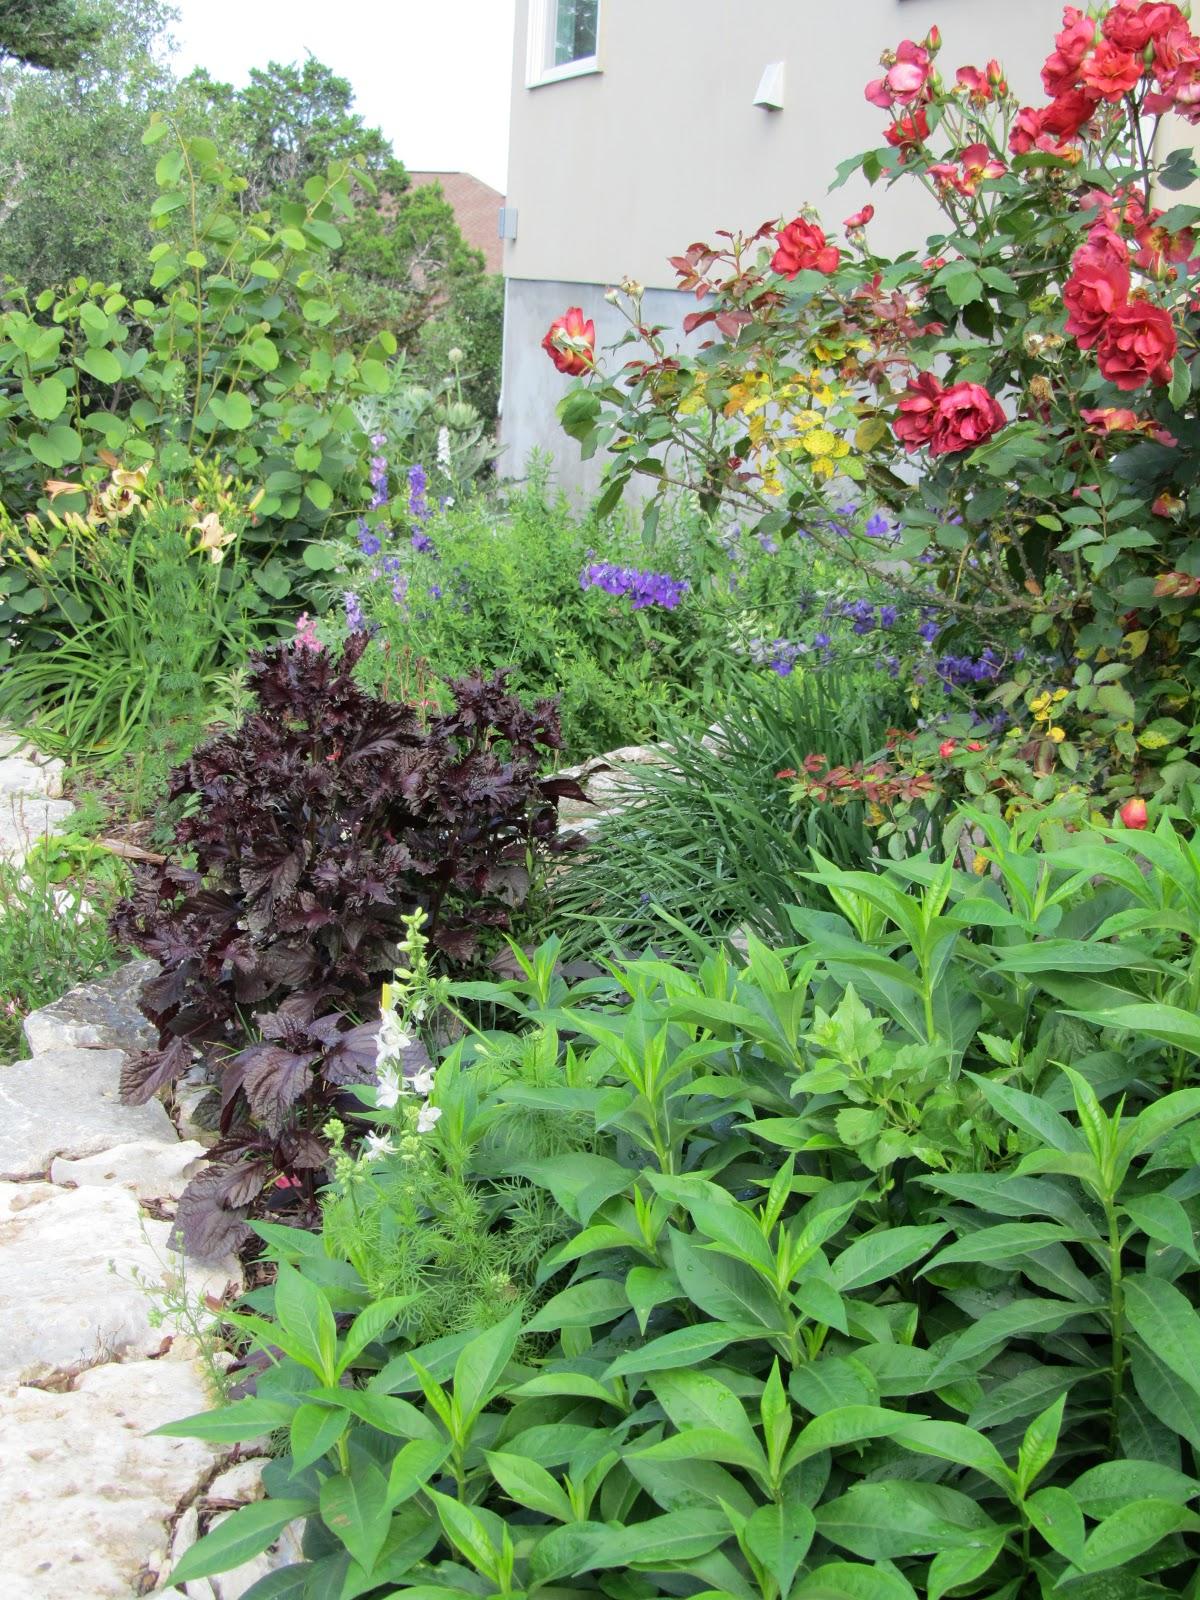 Hastypearl: May Garden In South Central Texas on hosta and daylily garden, hosta and caladium garden, hosta garden plans blueprints, hosta and hydrangea garden,